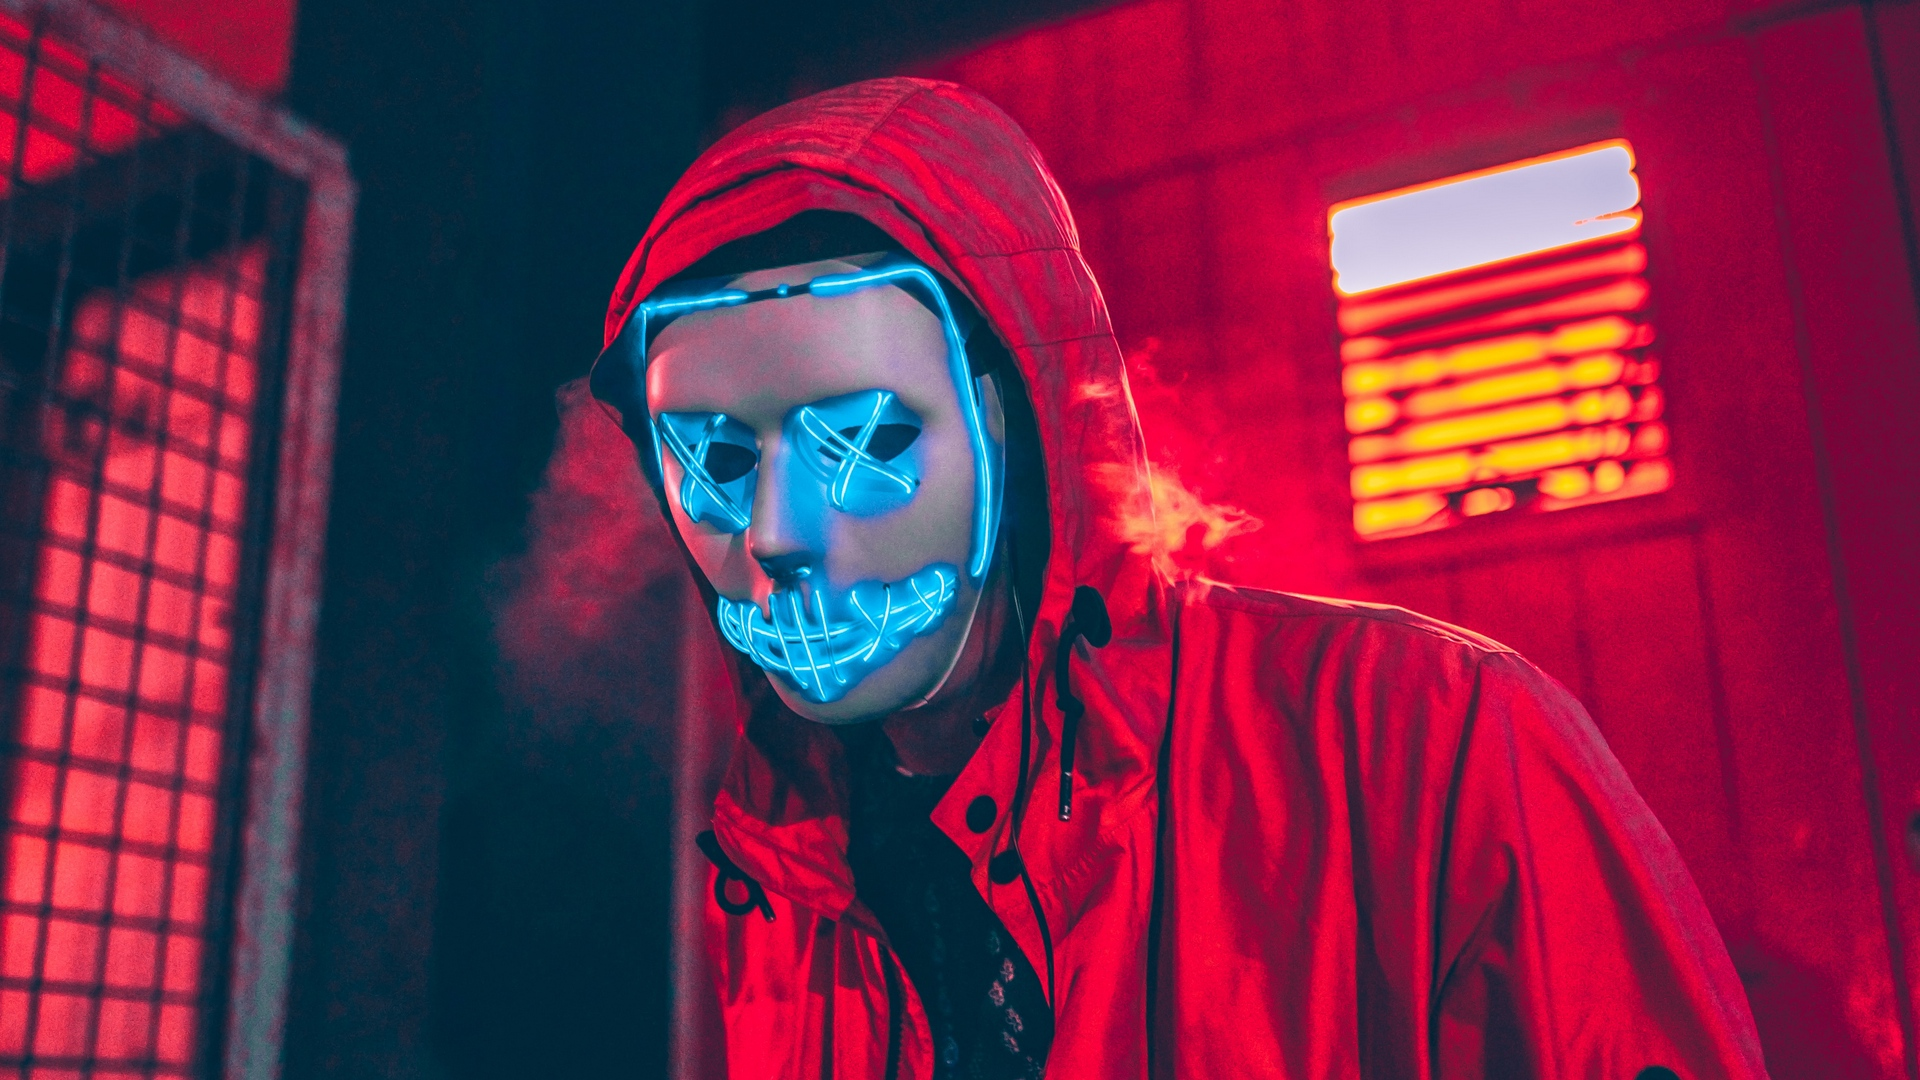 Neon Mask 2020 wallpaper